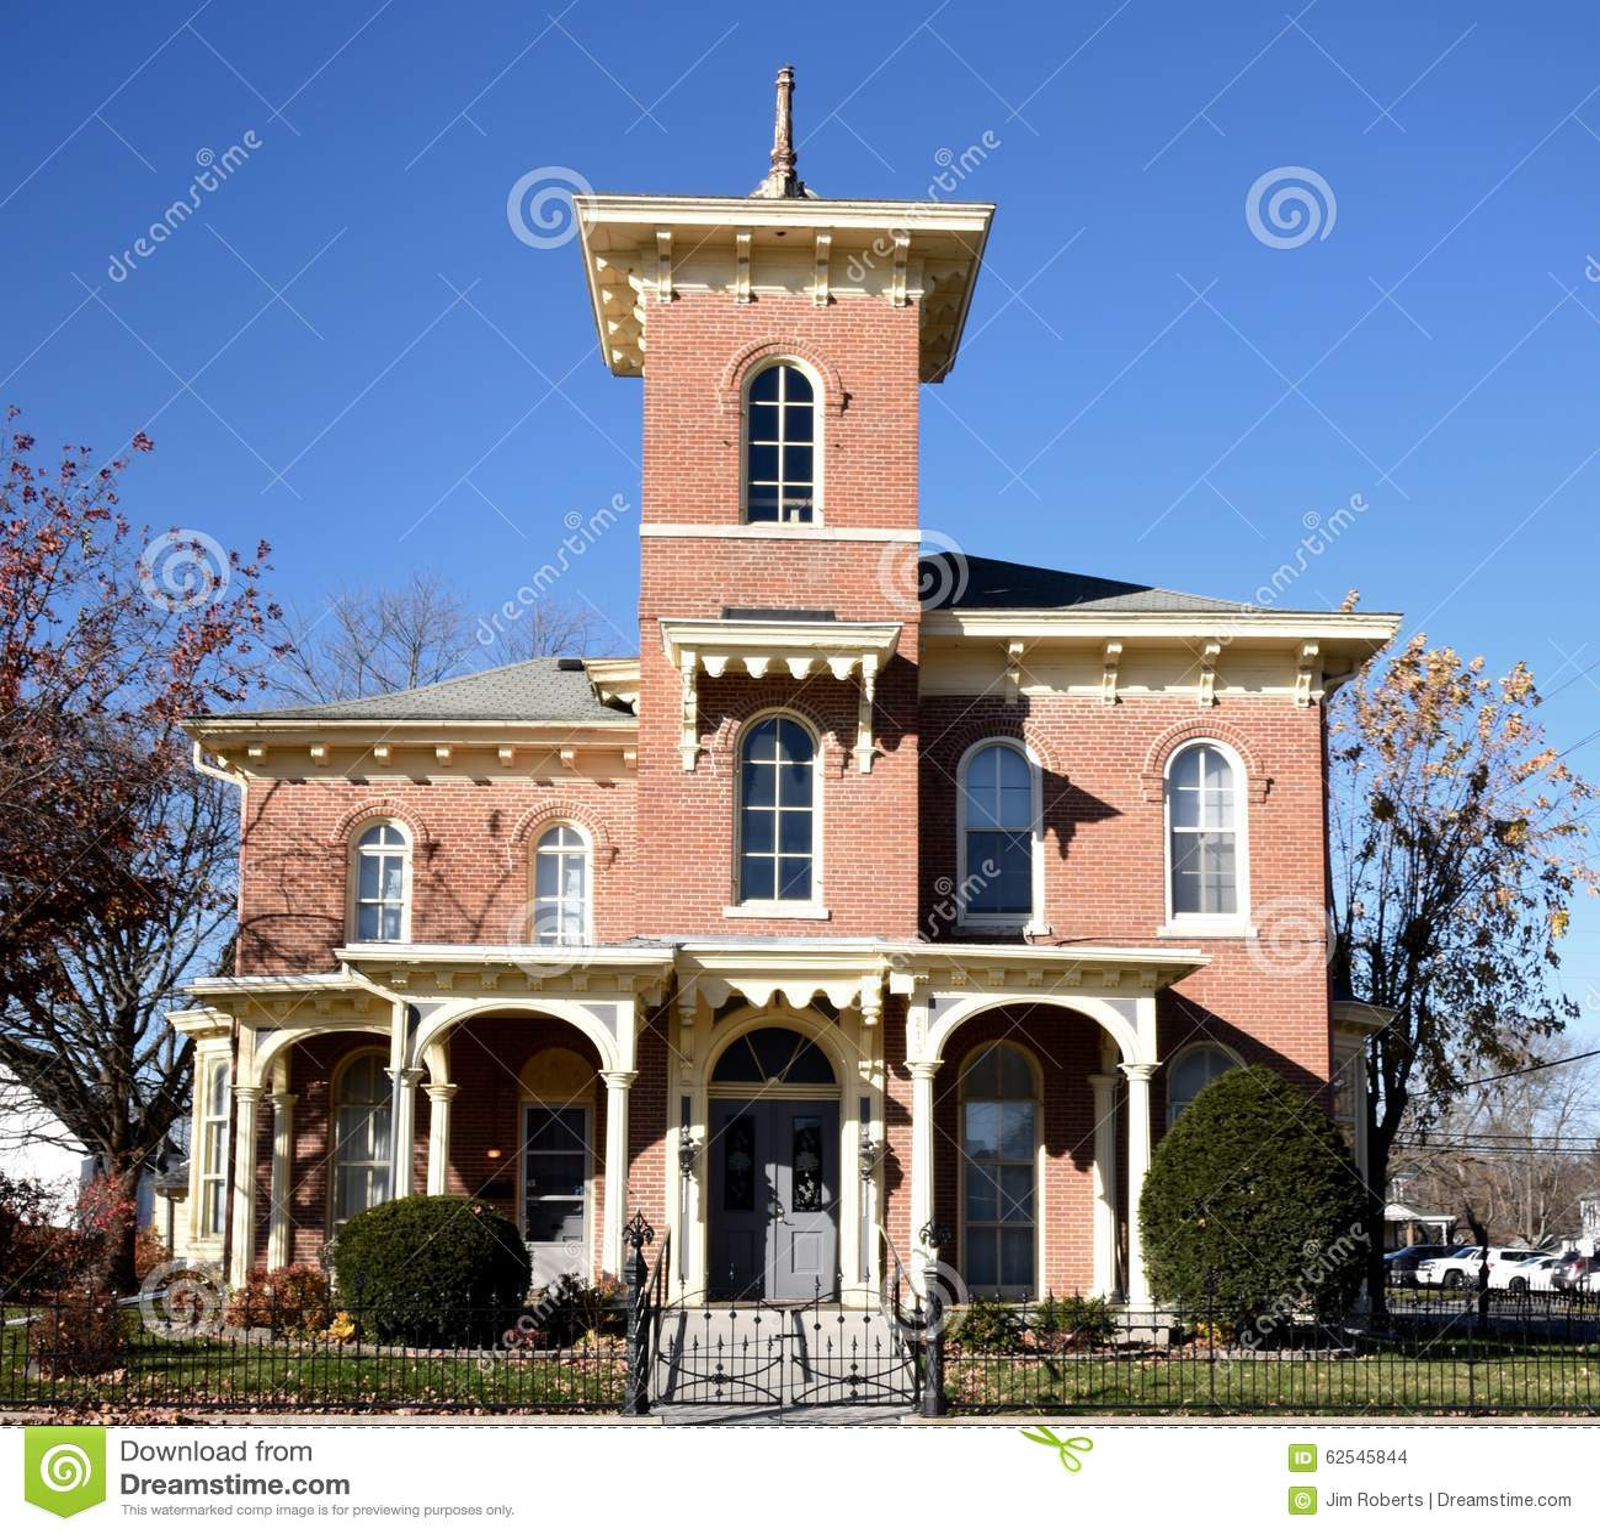 Mt Pleasant Iowa >> 19th Century Italianate editorial stock image. Image of ...